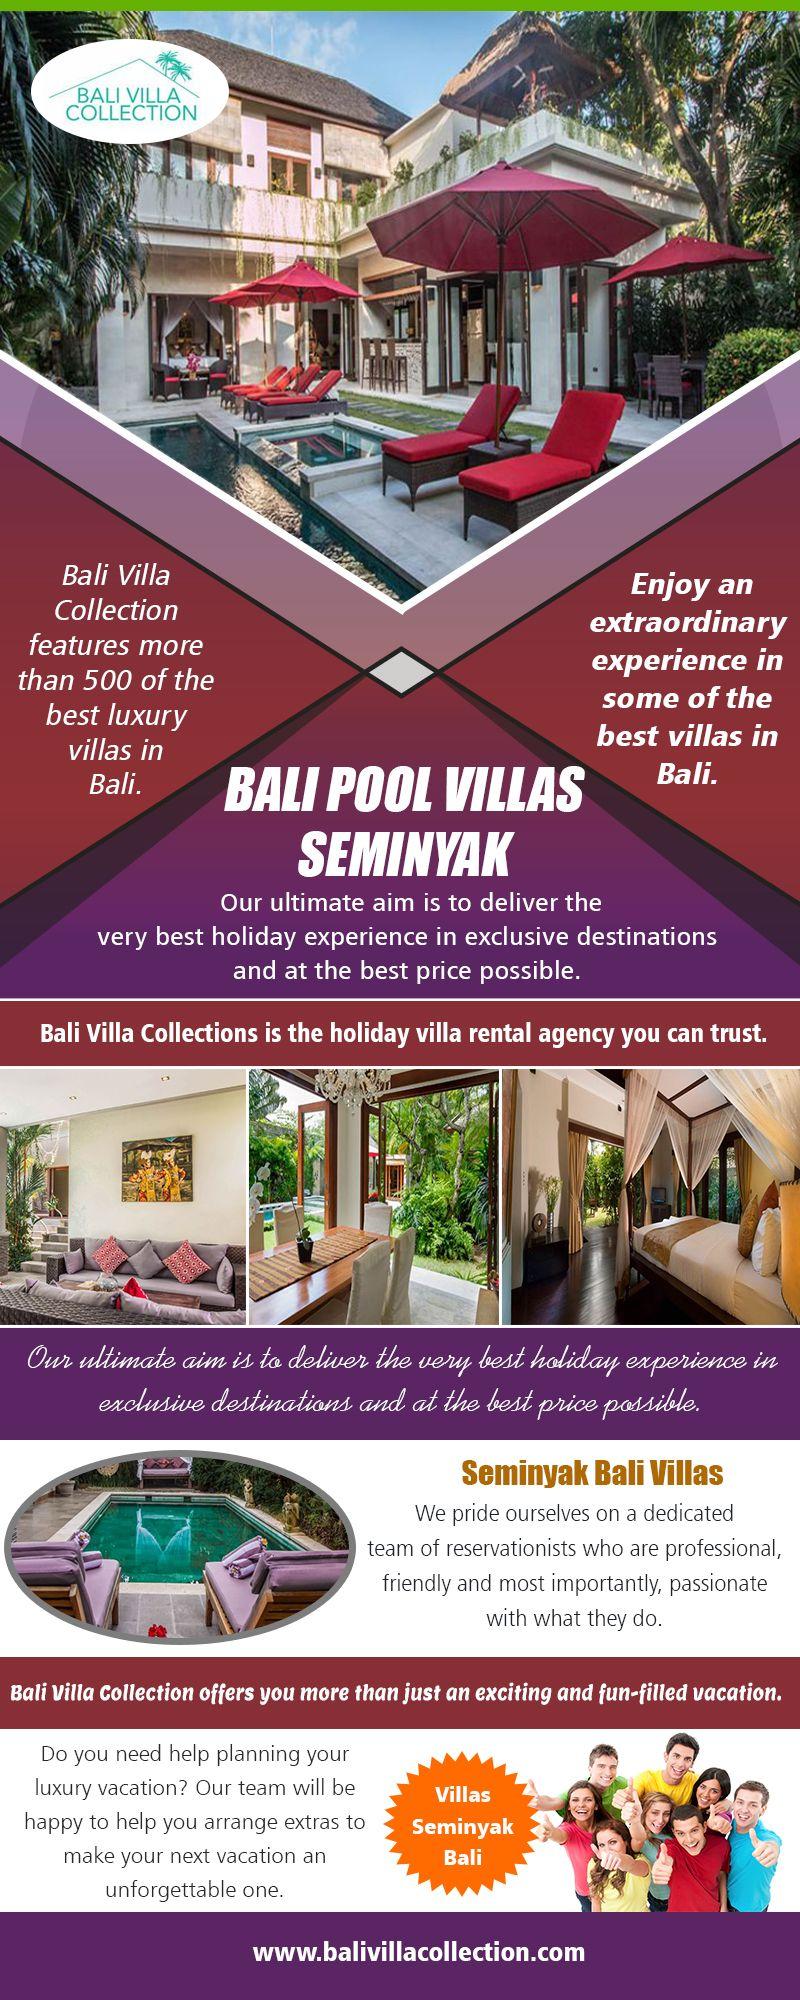 Bali Pool Villas Seminyak Bali Luxury Villas Luxury Villa Villa